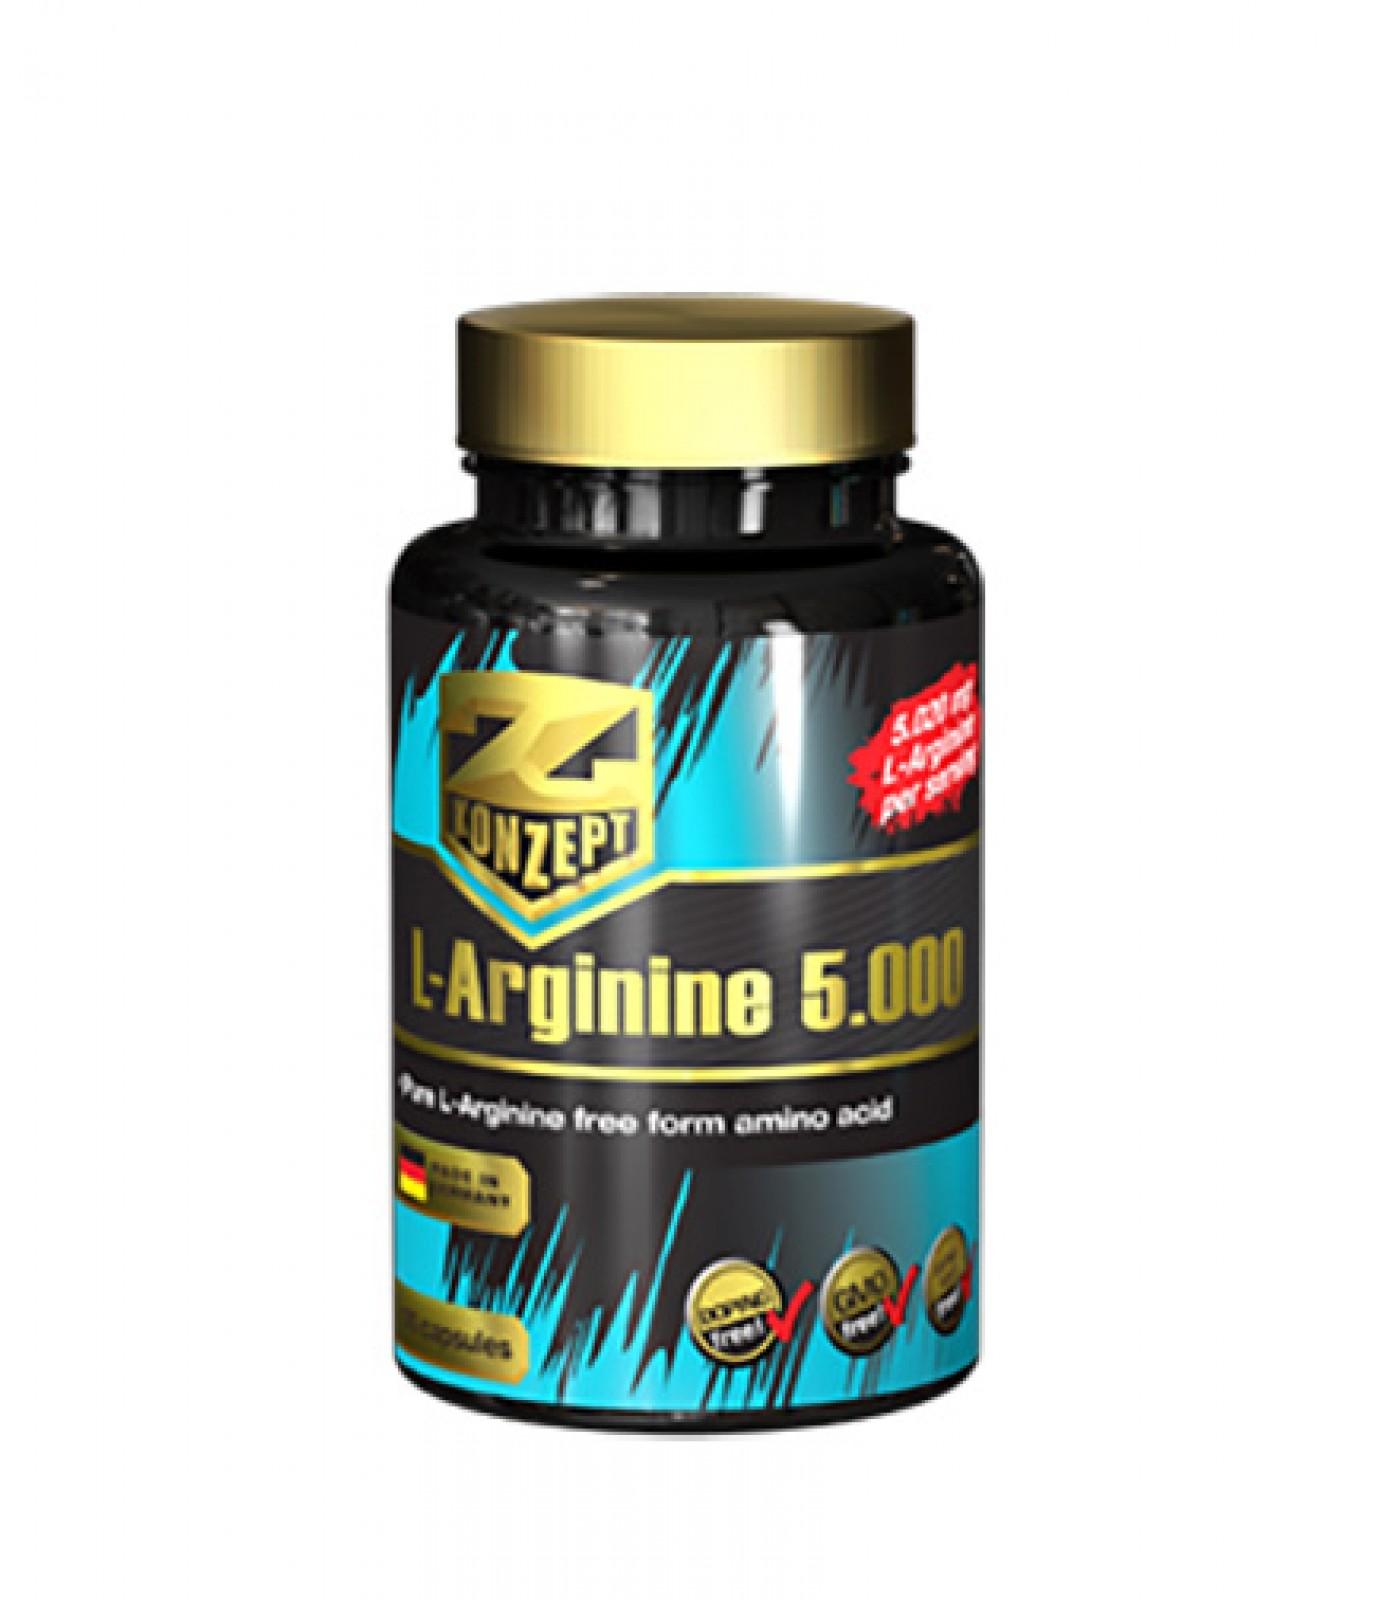 Z Konzept - L-Arginine 5.000 / 100caps.